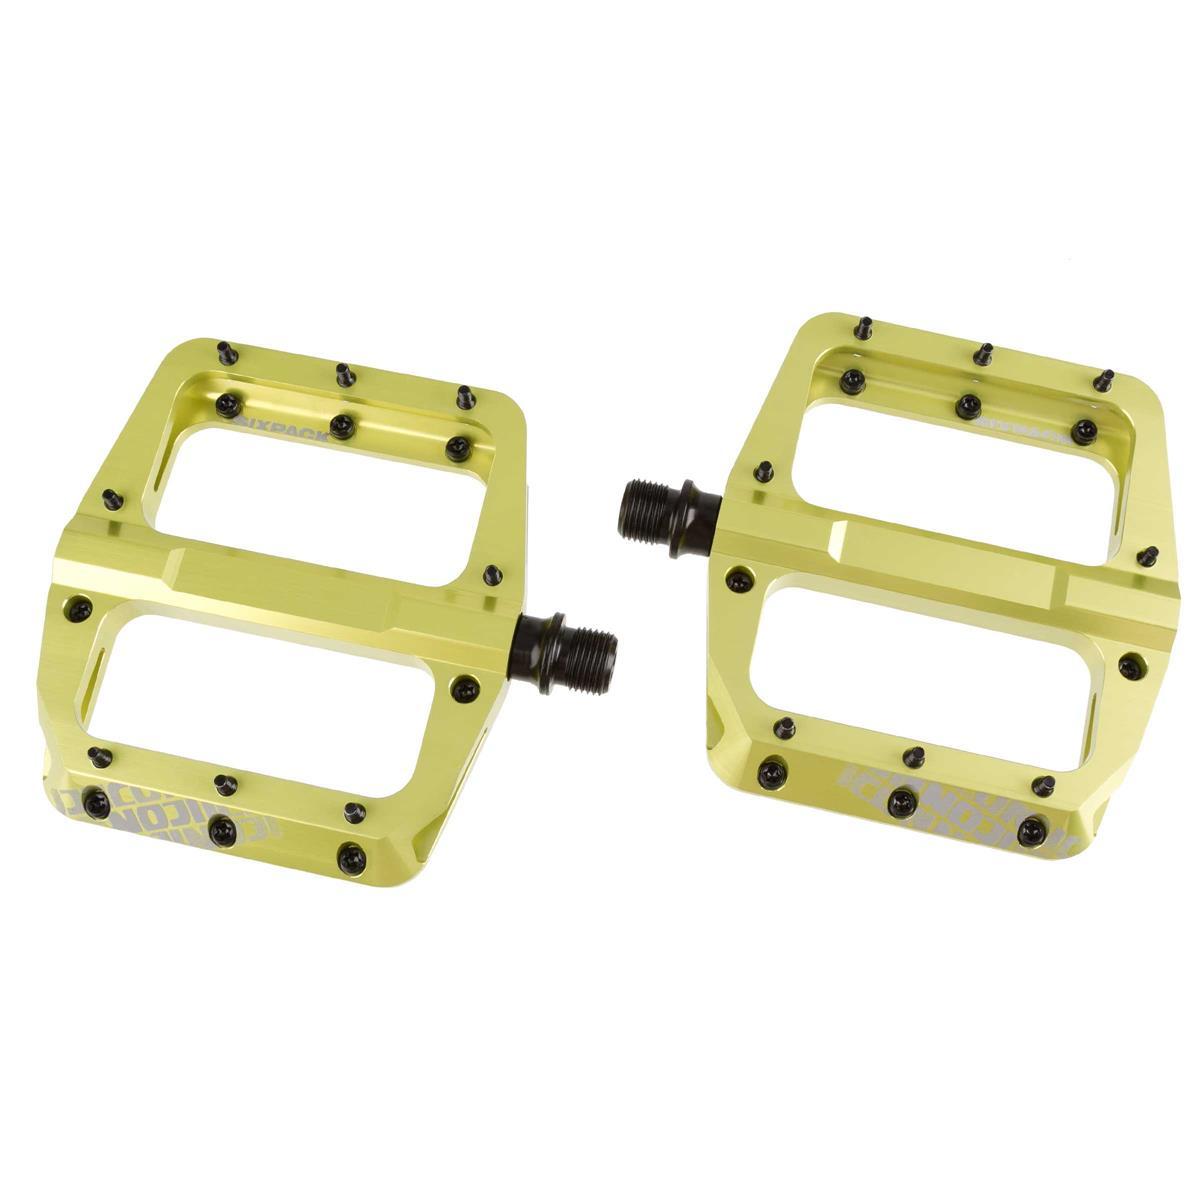 Sixpack Plattform-Pedal Icon 2.0 Electric Green, 100x110 mm, 32 M4 Torx Pins, 1 Paar